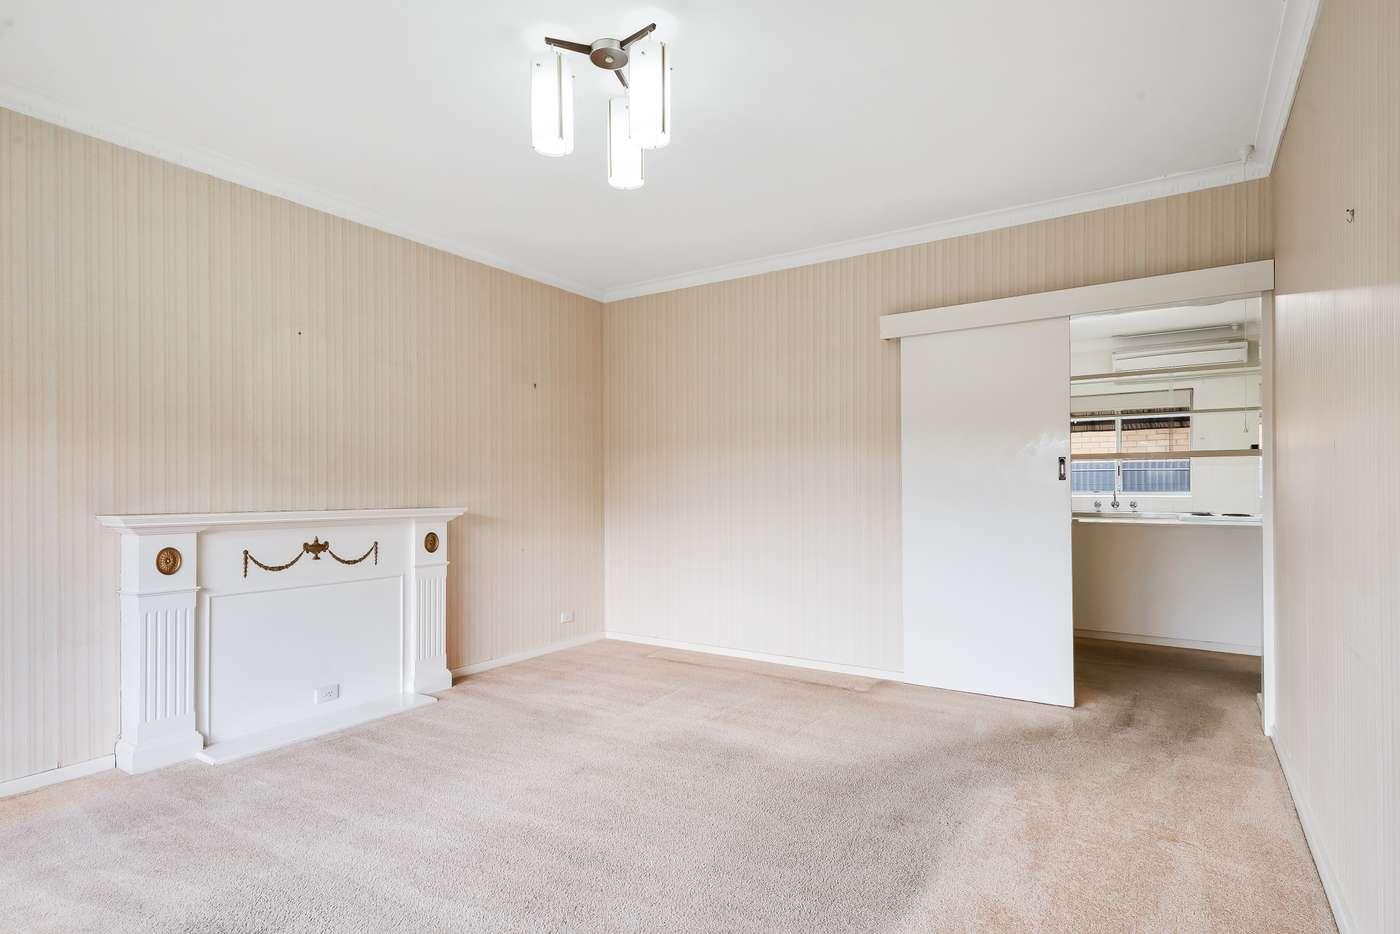 Fifth view of Homely house listing, 3/15 Marlborough Street, Brighton SA 5048